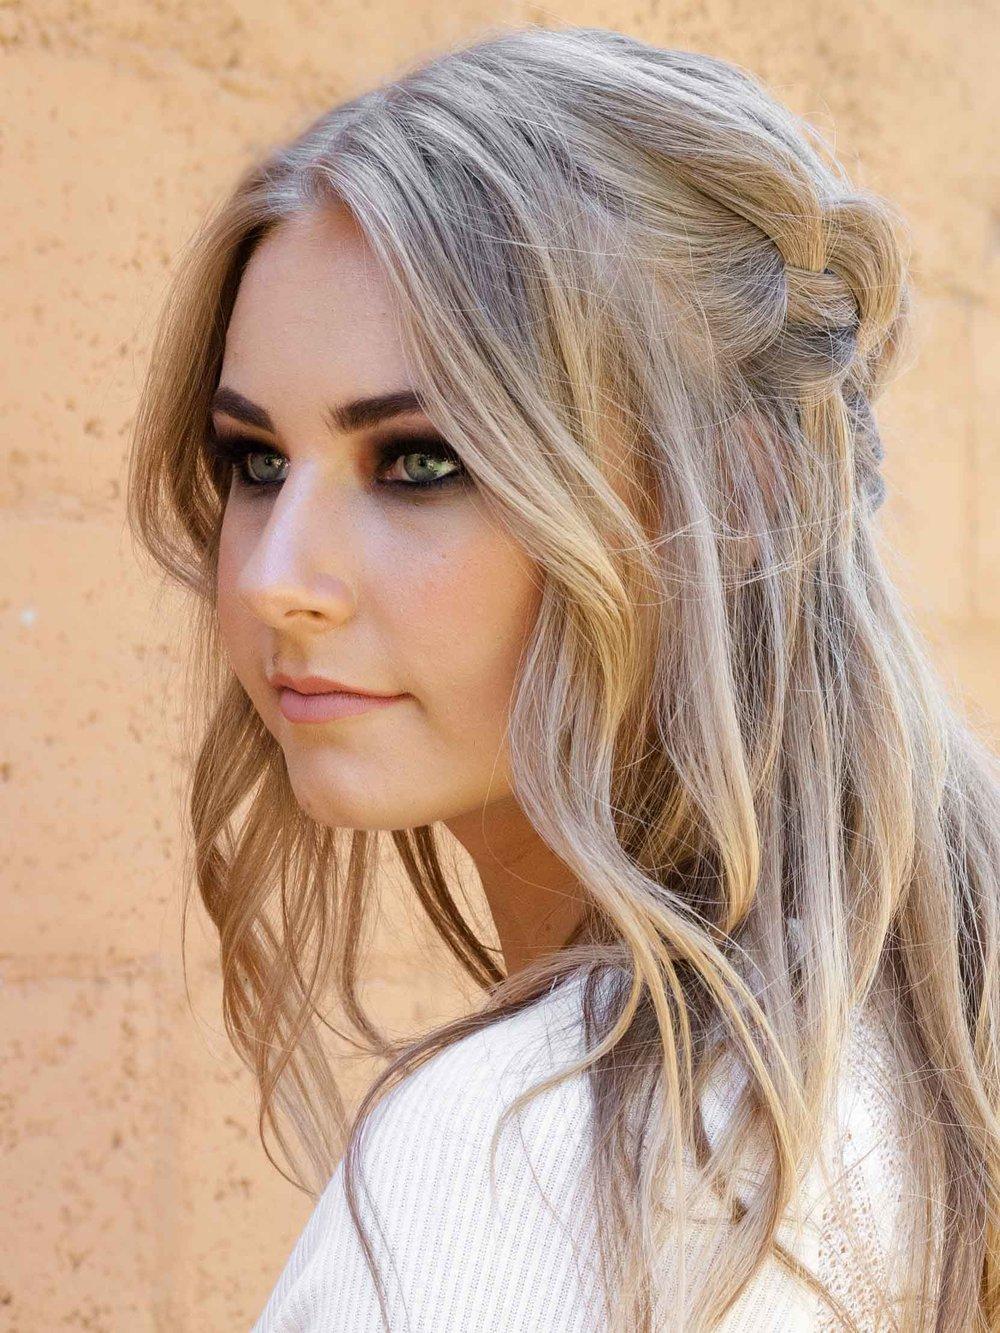 talia-whatcott-makeup-artist-portfolio-blog-hair-waterfall-braid-smoky-eye-matte-lip-bridal-wedding-tousled-curls-1-8.jpg